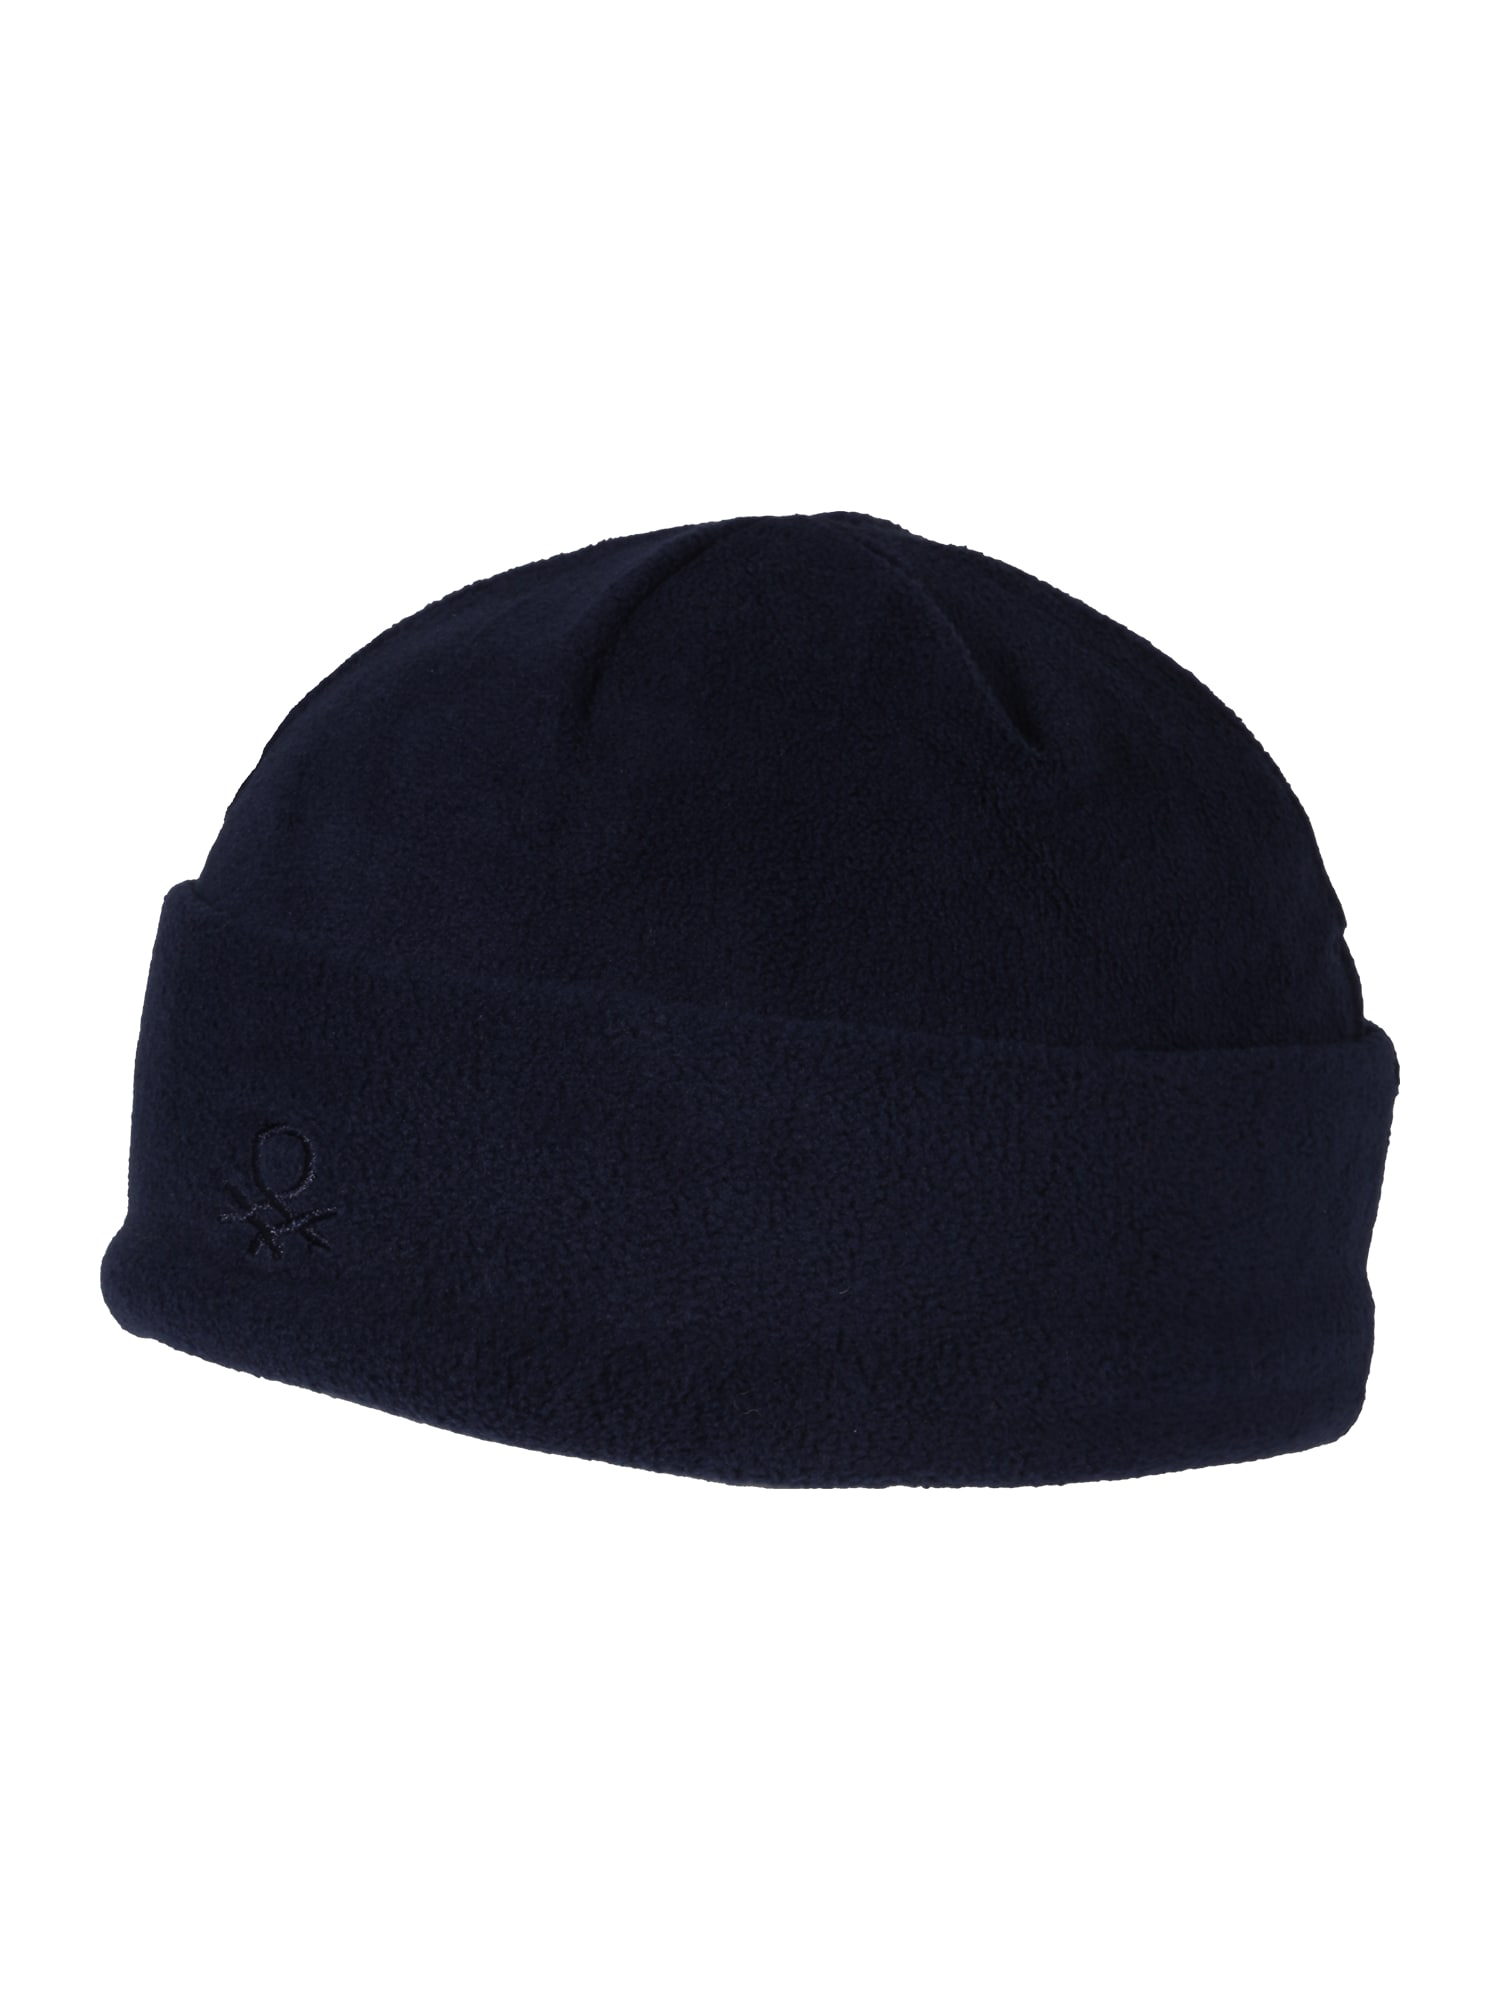 UNITED COLORS OF BENETTON Megzta kepurė tamsiai mėlyna jūros spalva